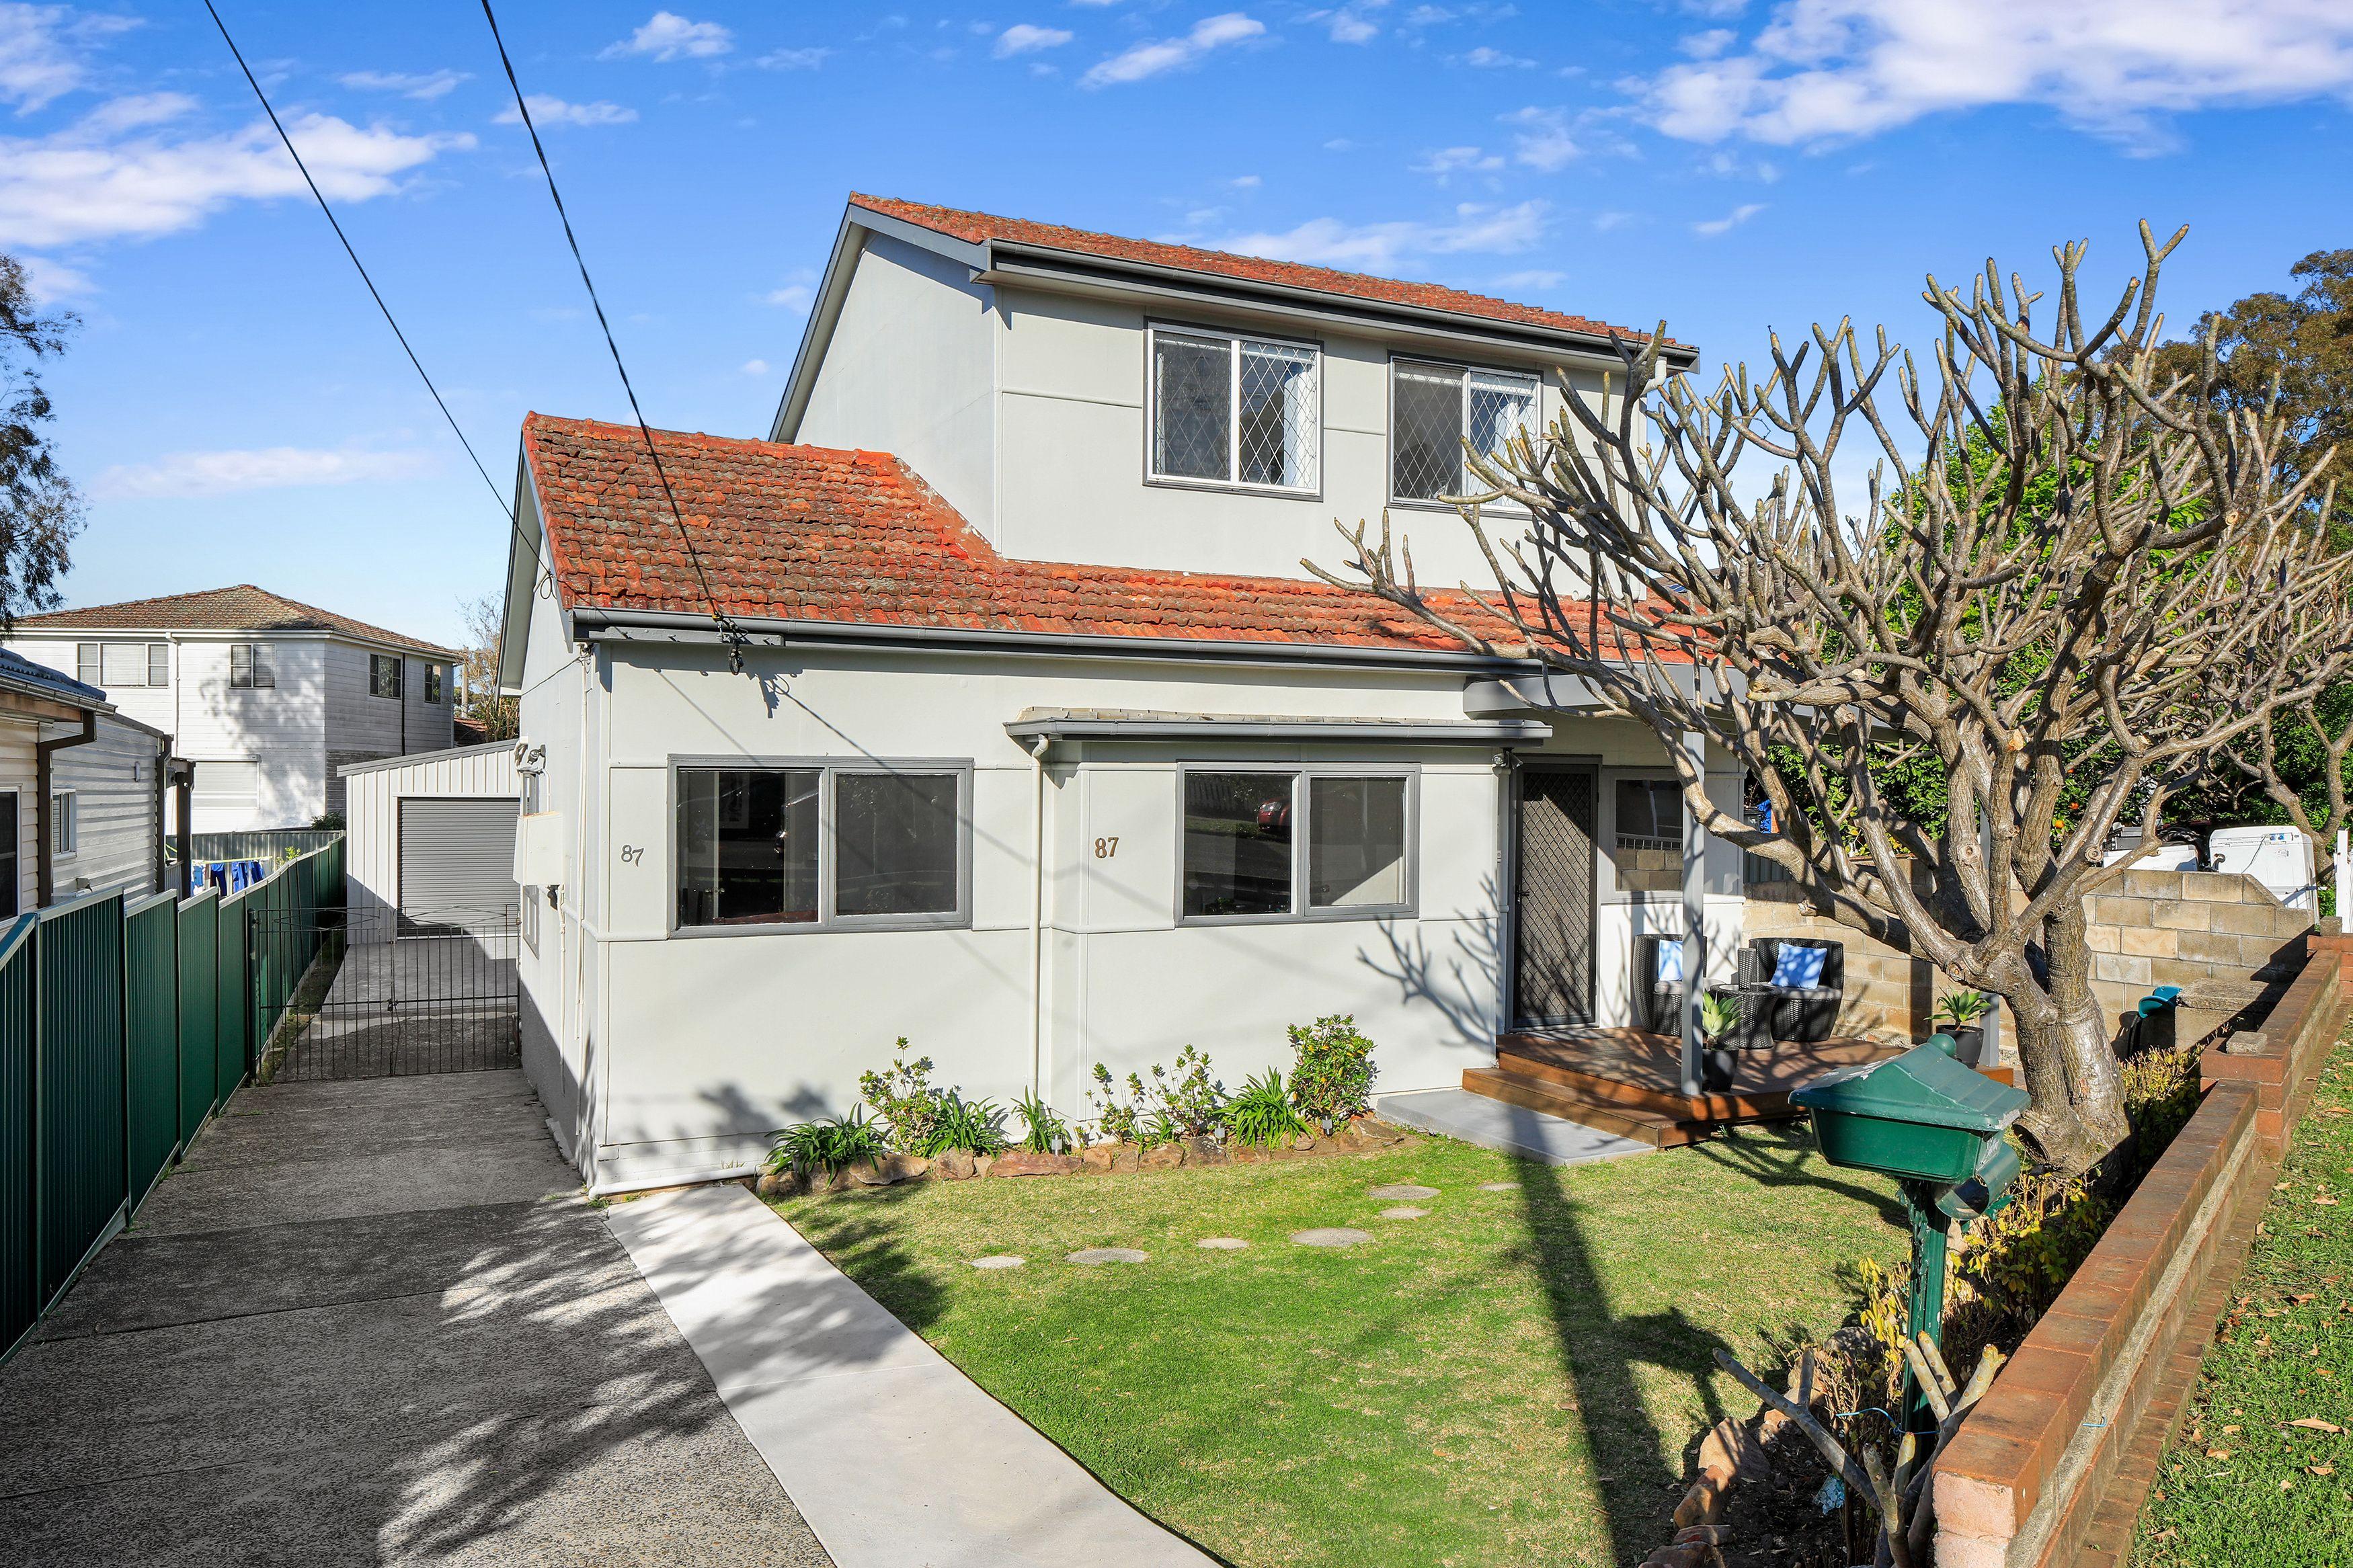 87 Baumans Road, Peakhurst NSW 2210